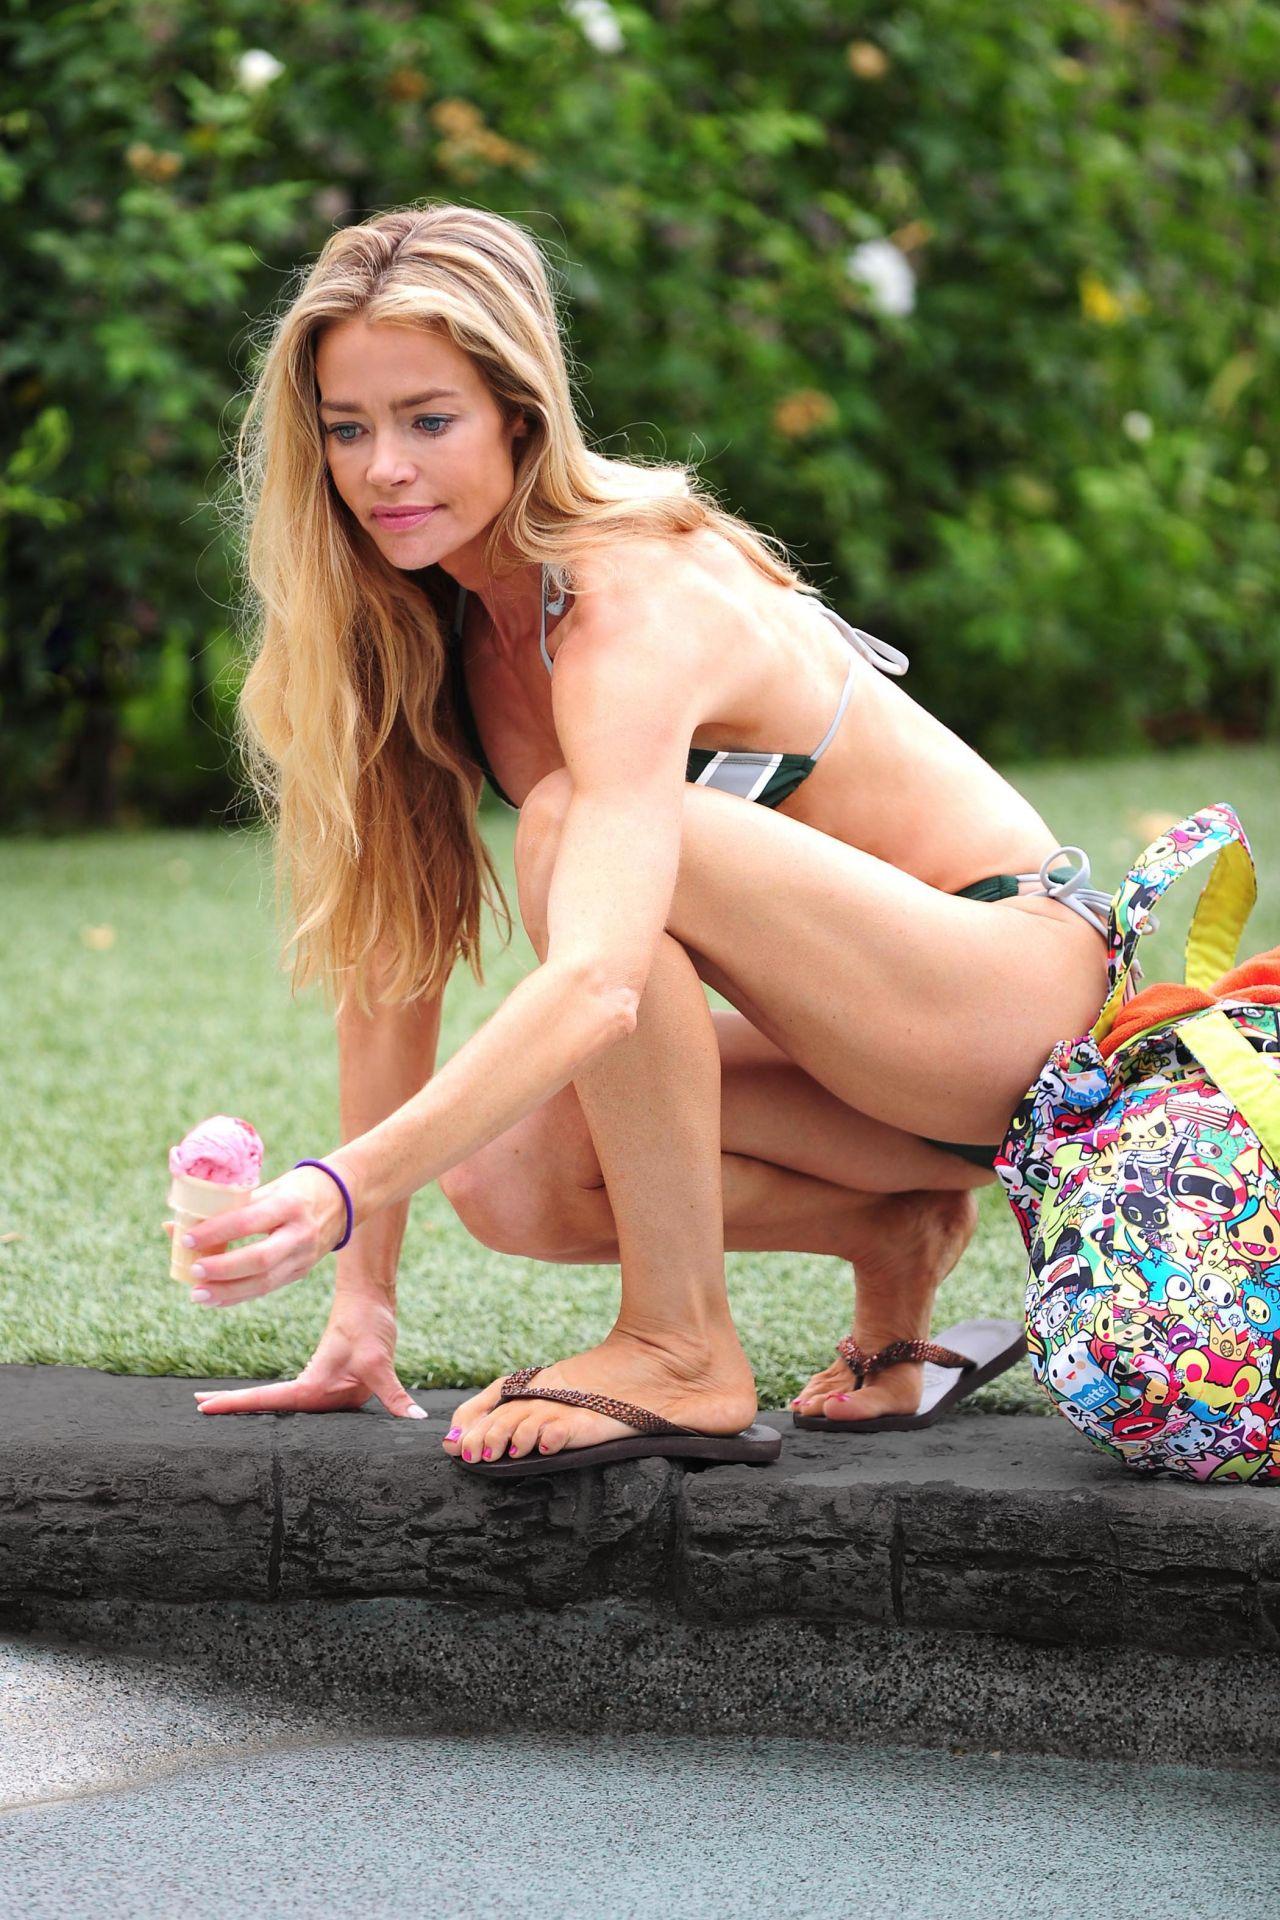 Wallpaper Volley Girl Denise Richards In A Bikini Licking An Ice Cream In La